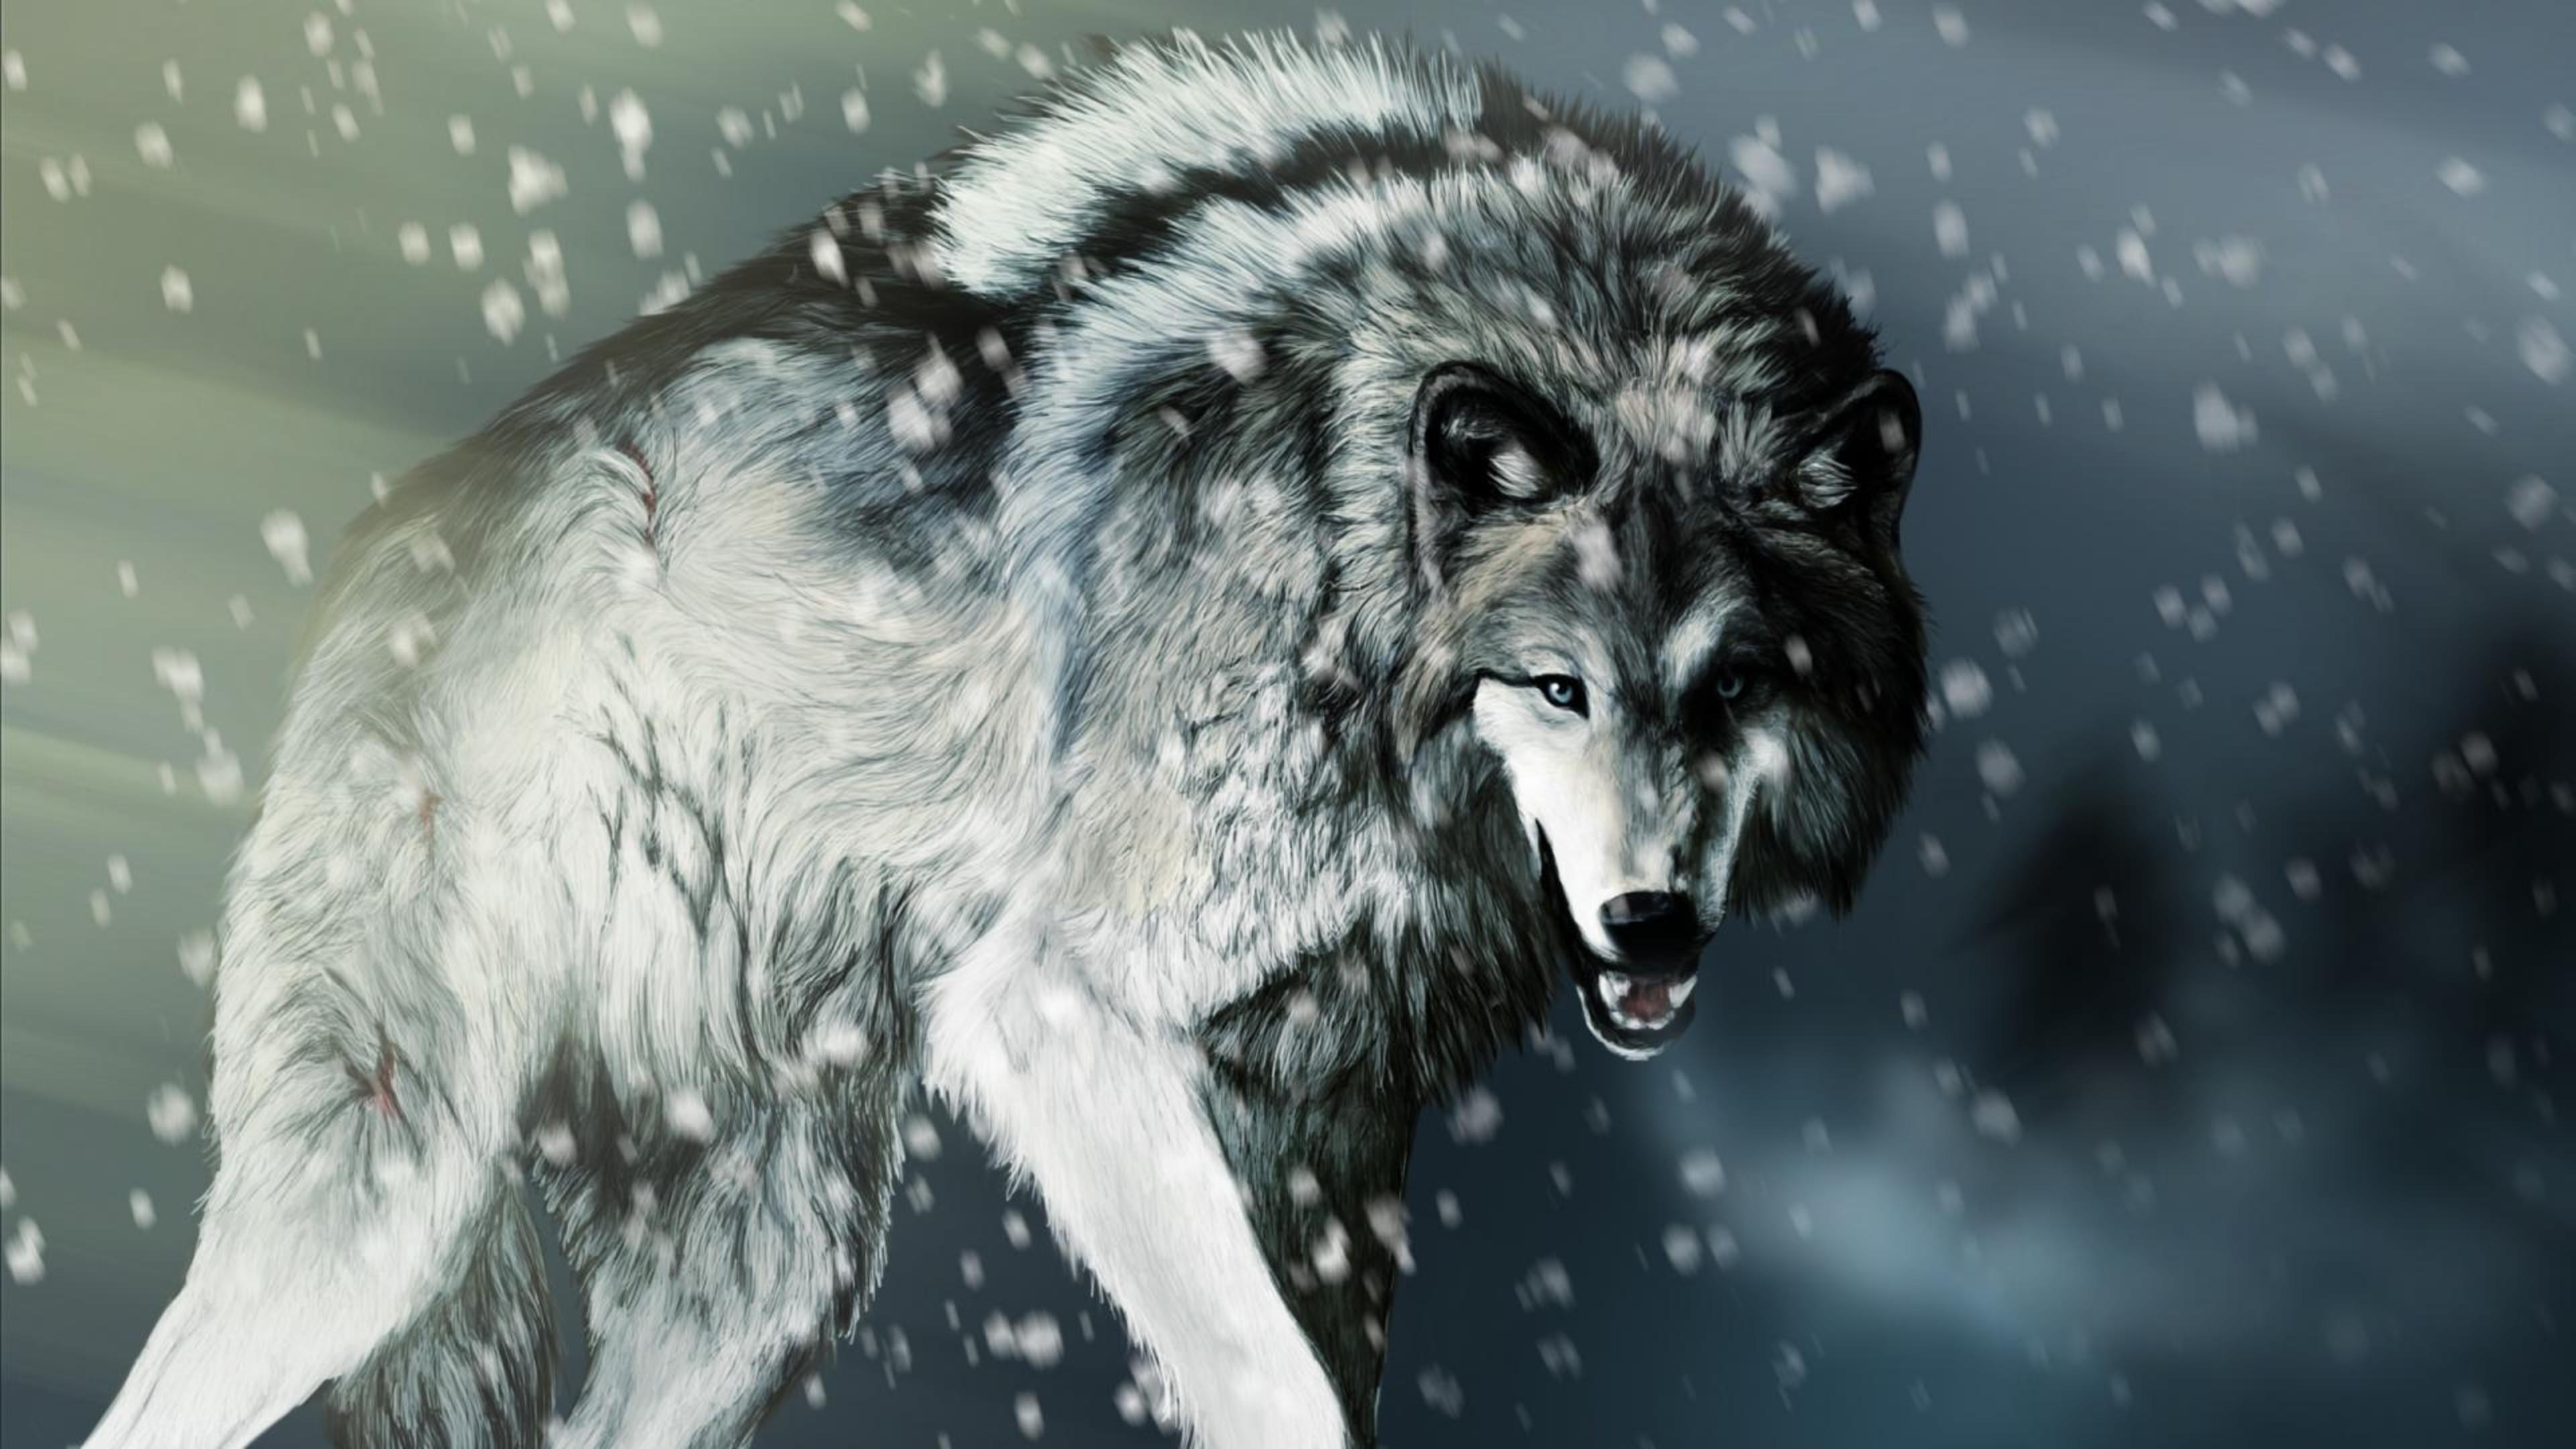 Wolf Wallpaper Desktop (70+ Images